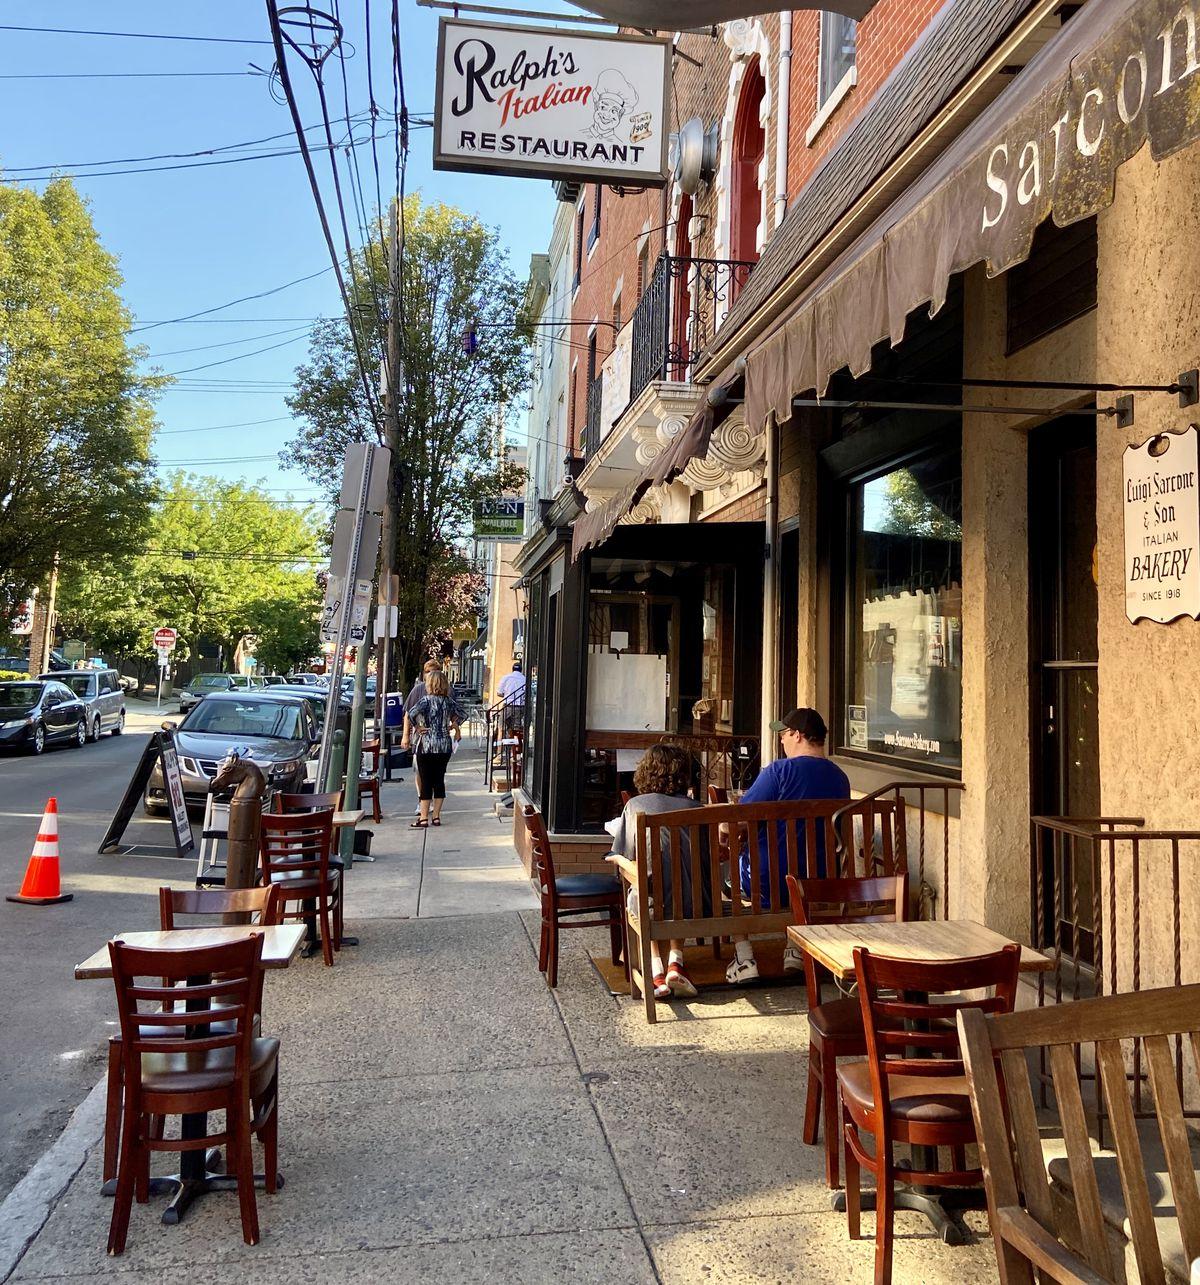 sidewalk seating in front of restaurant